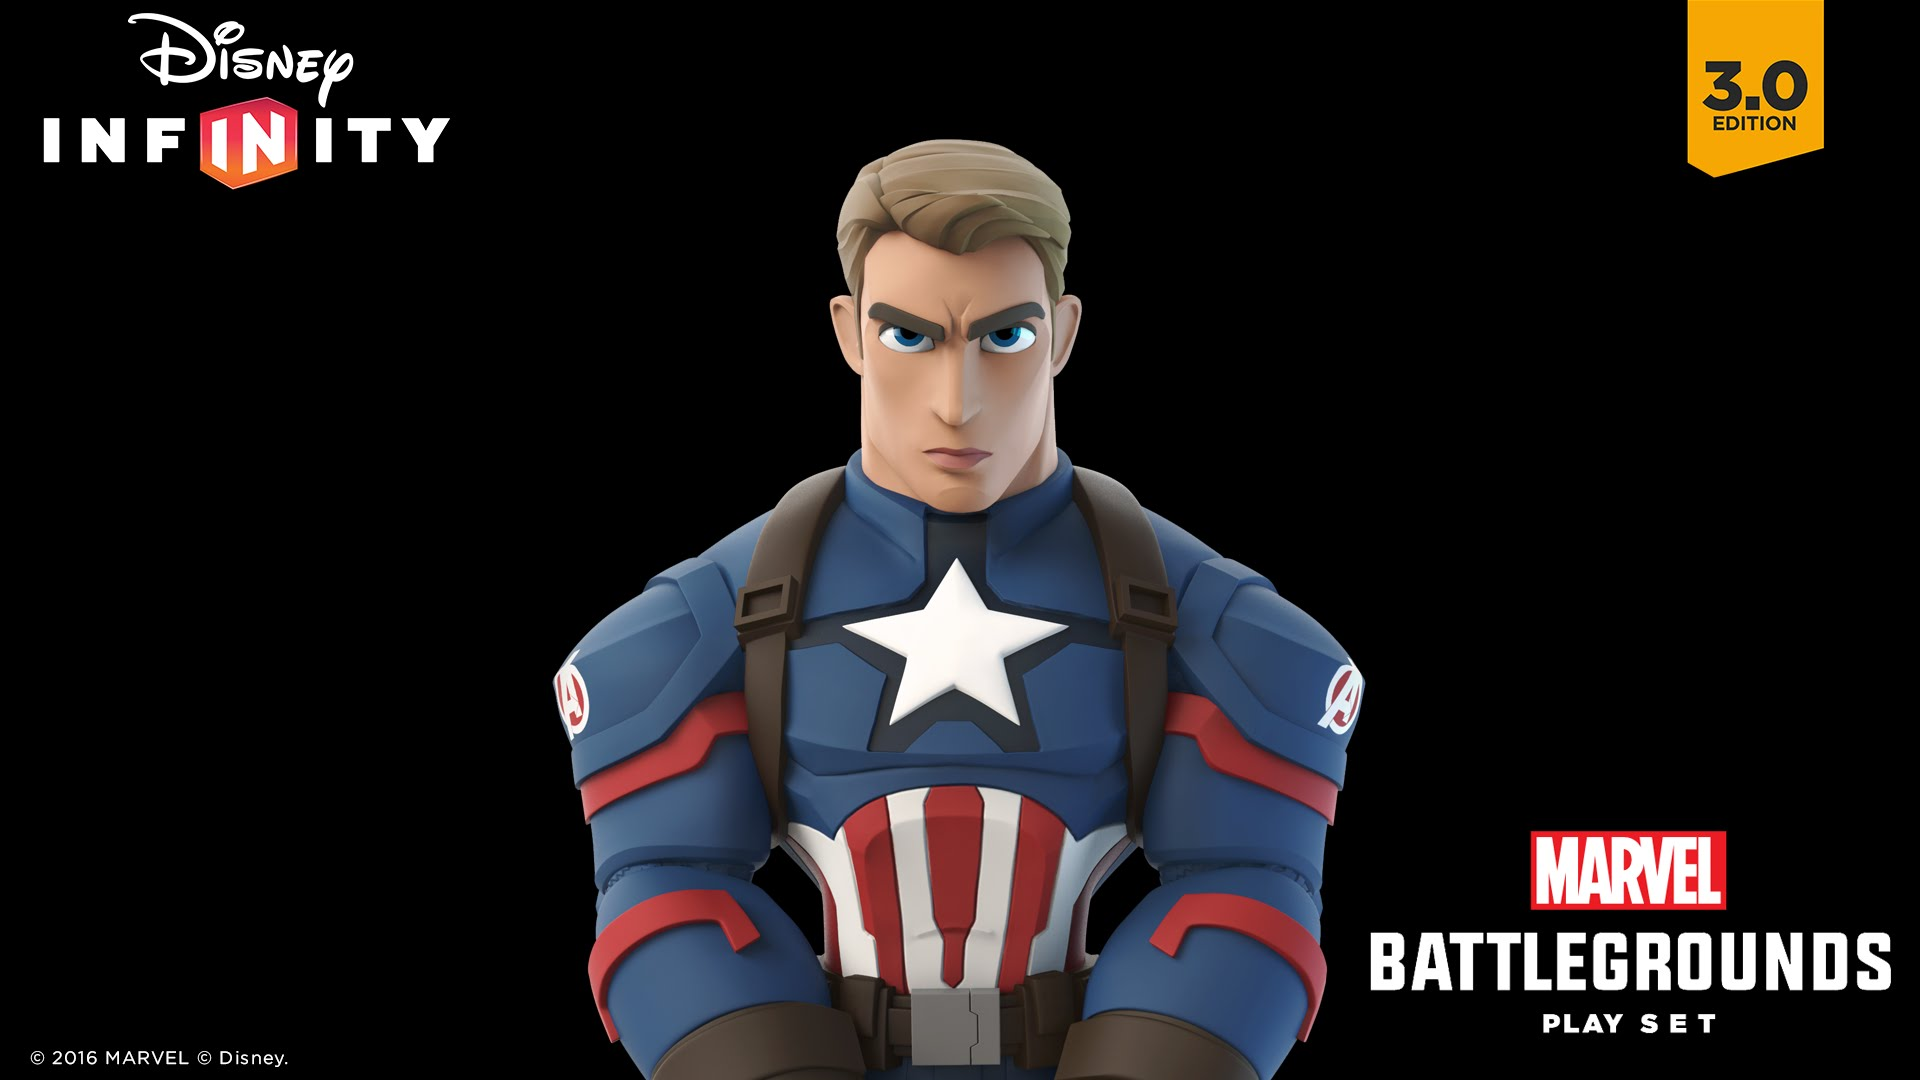 Marvel Battlegrounds Play Set Official Launch Trailer | Disney Infinity 3.0